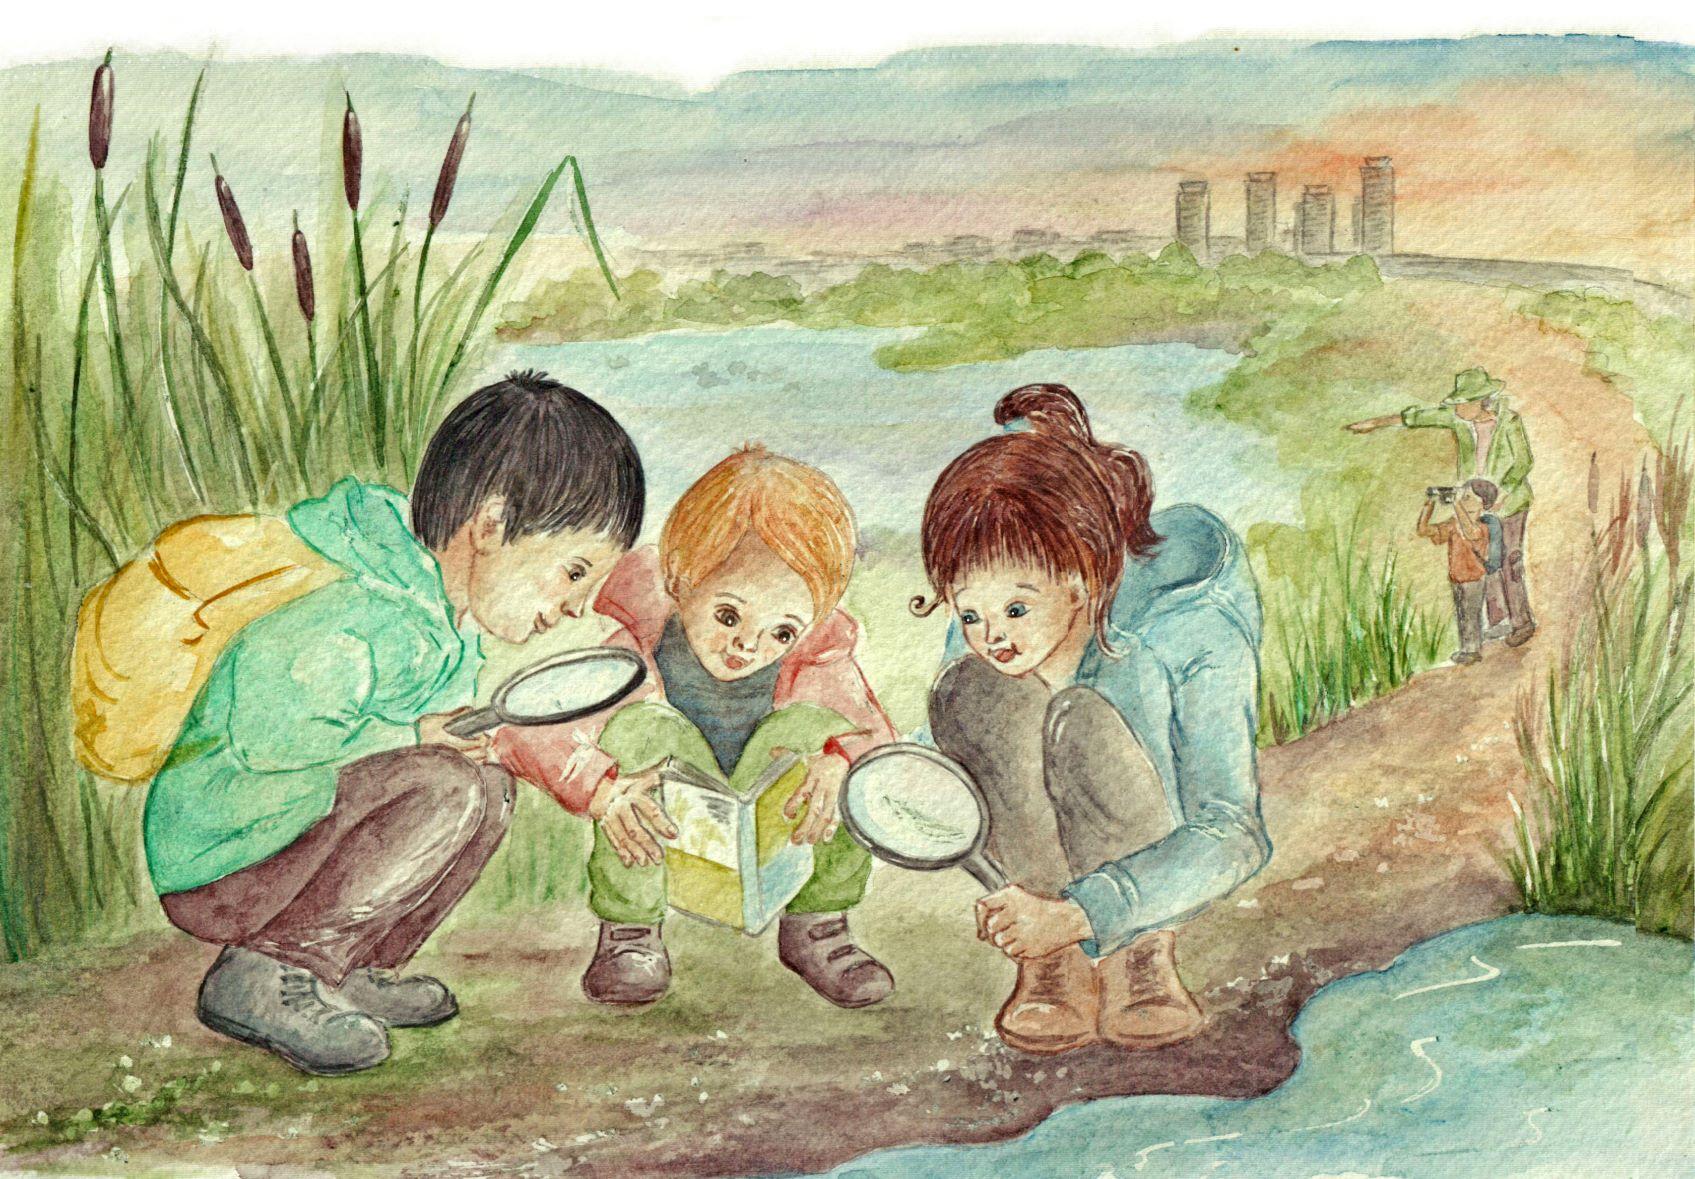 beneficii_educatie-in-natura-cu-copiii-mic.jpg